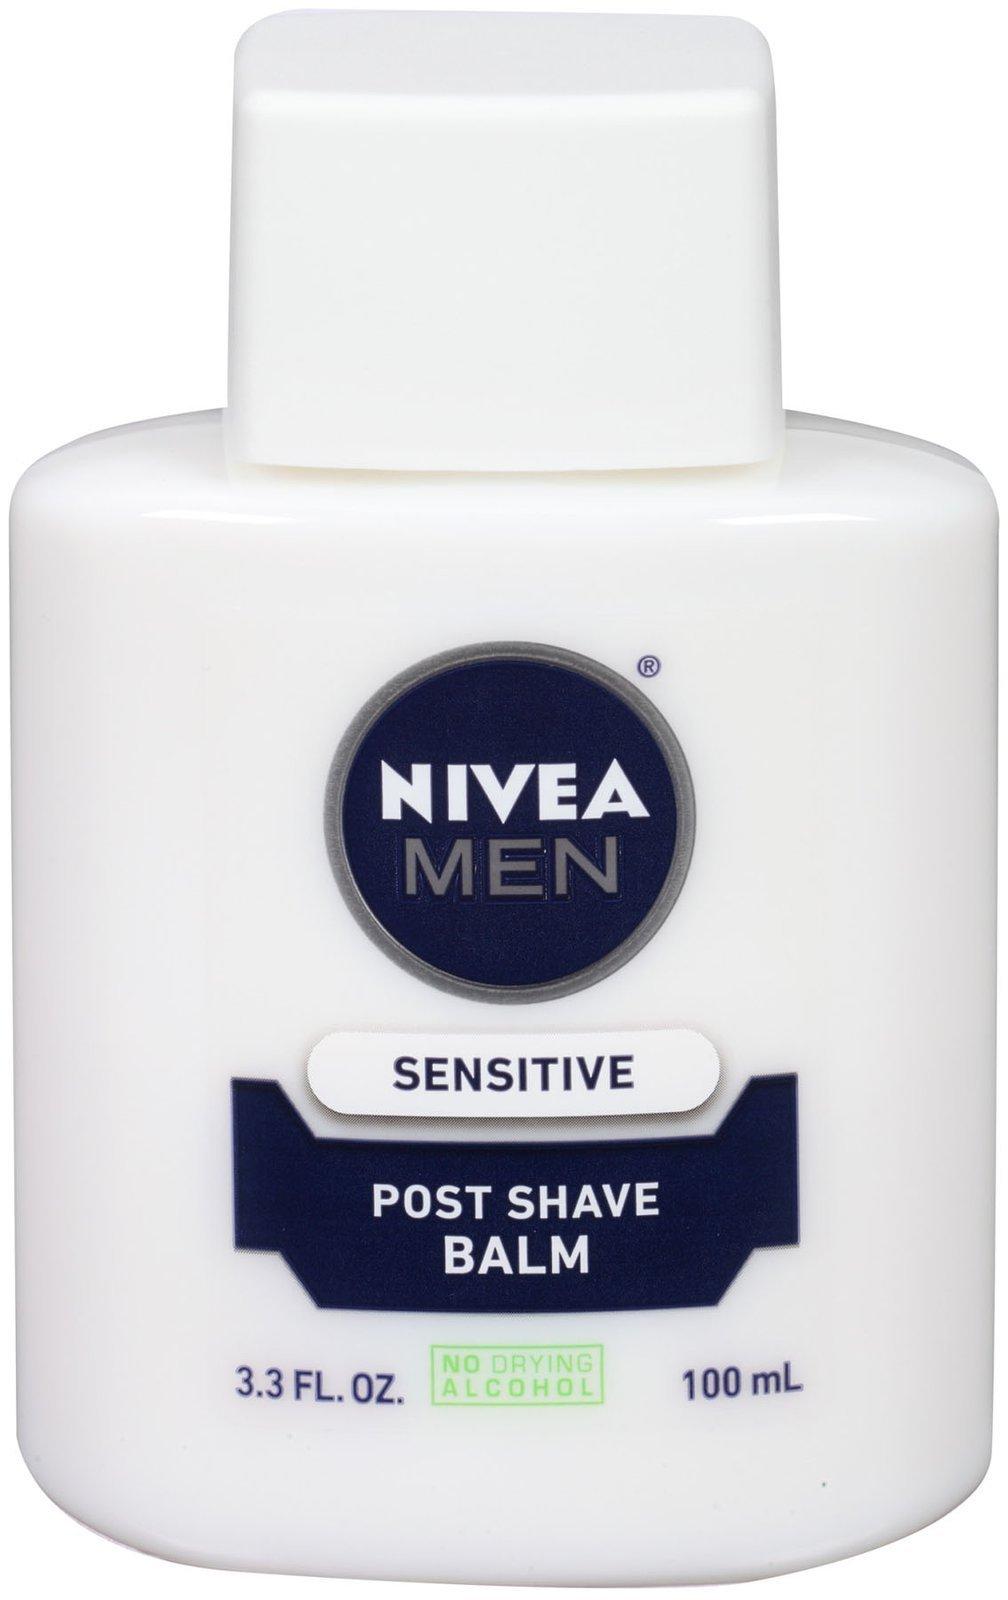 NIVEA FOR MEN Sensitive Post Shave Balm 3.3 oz